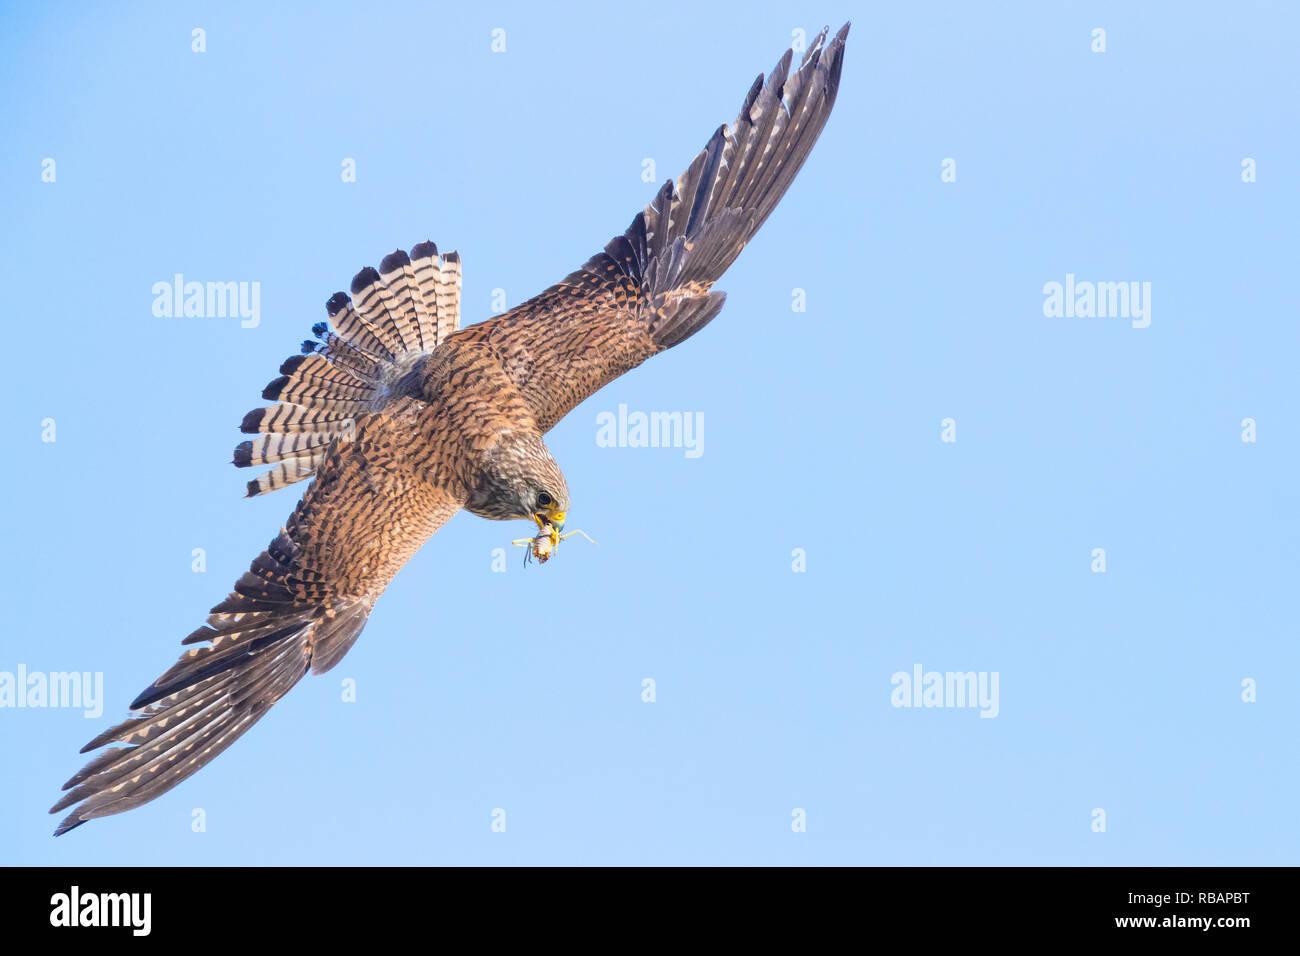 Lesser Kestrel (Falco naumanni), female in flight showing upperparts - Stock Image